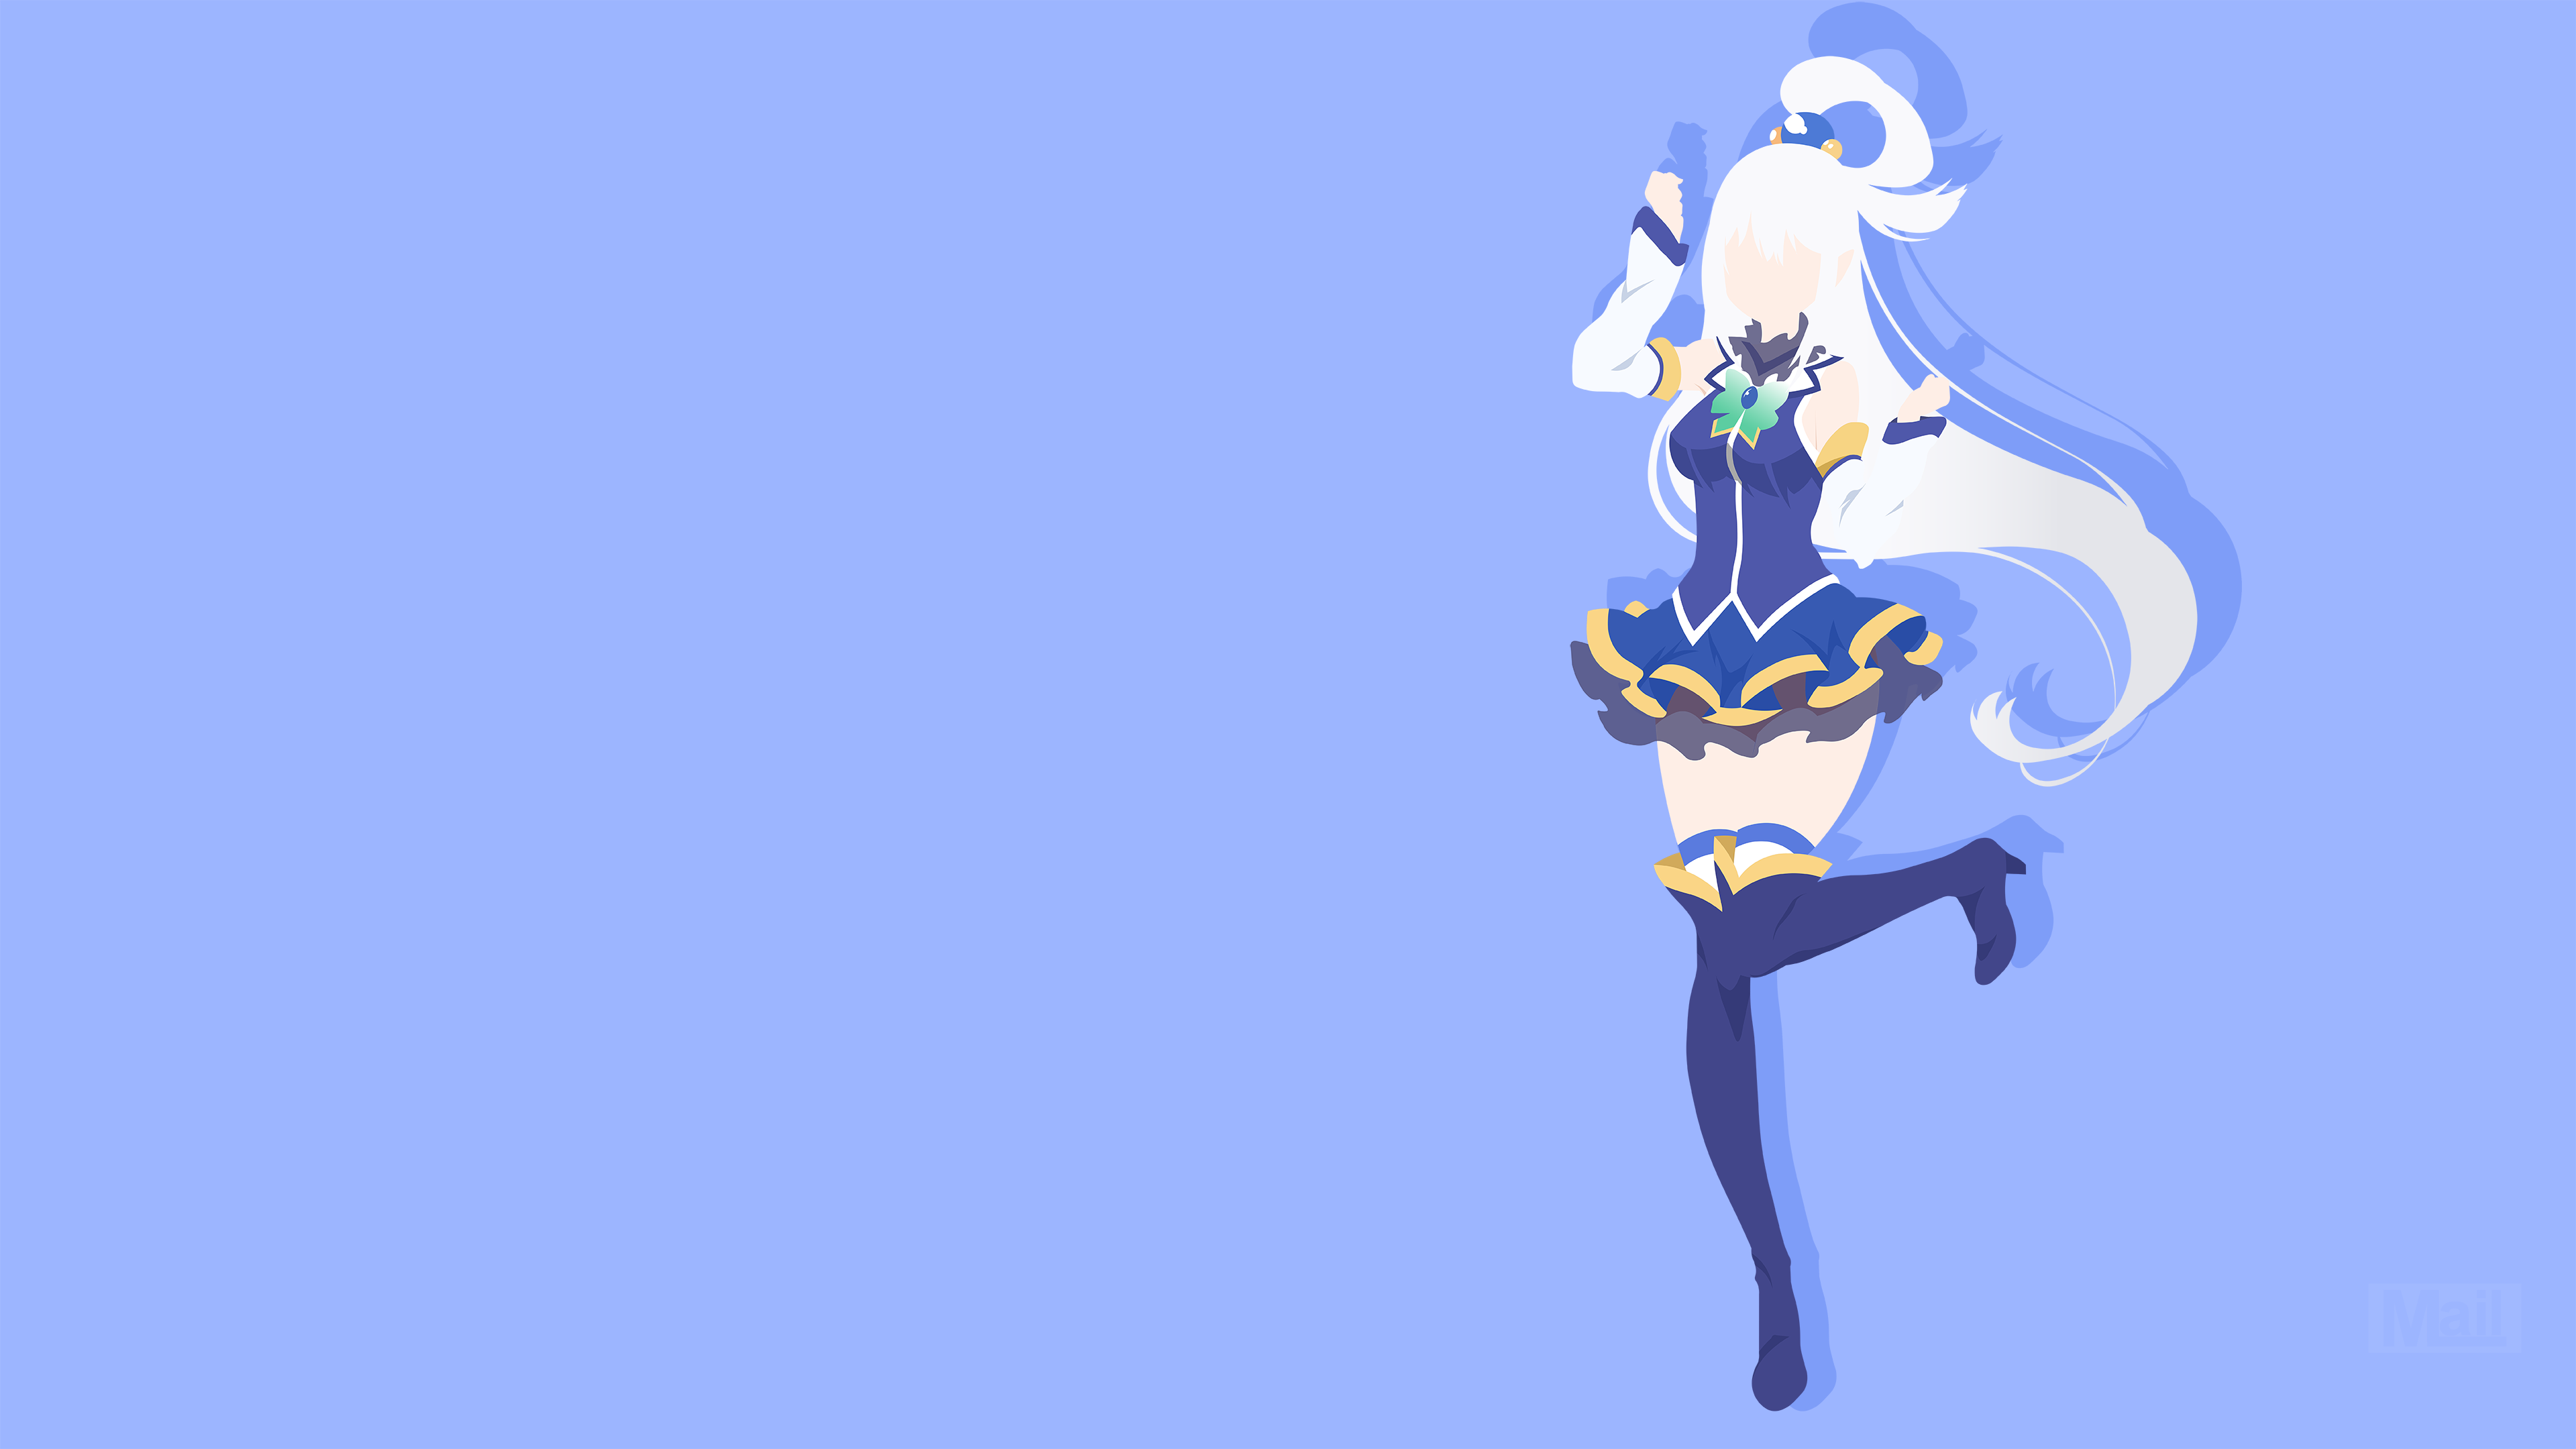 Pin by Rikki on Konosuba Aqua konosuba, Anime